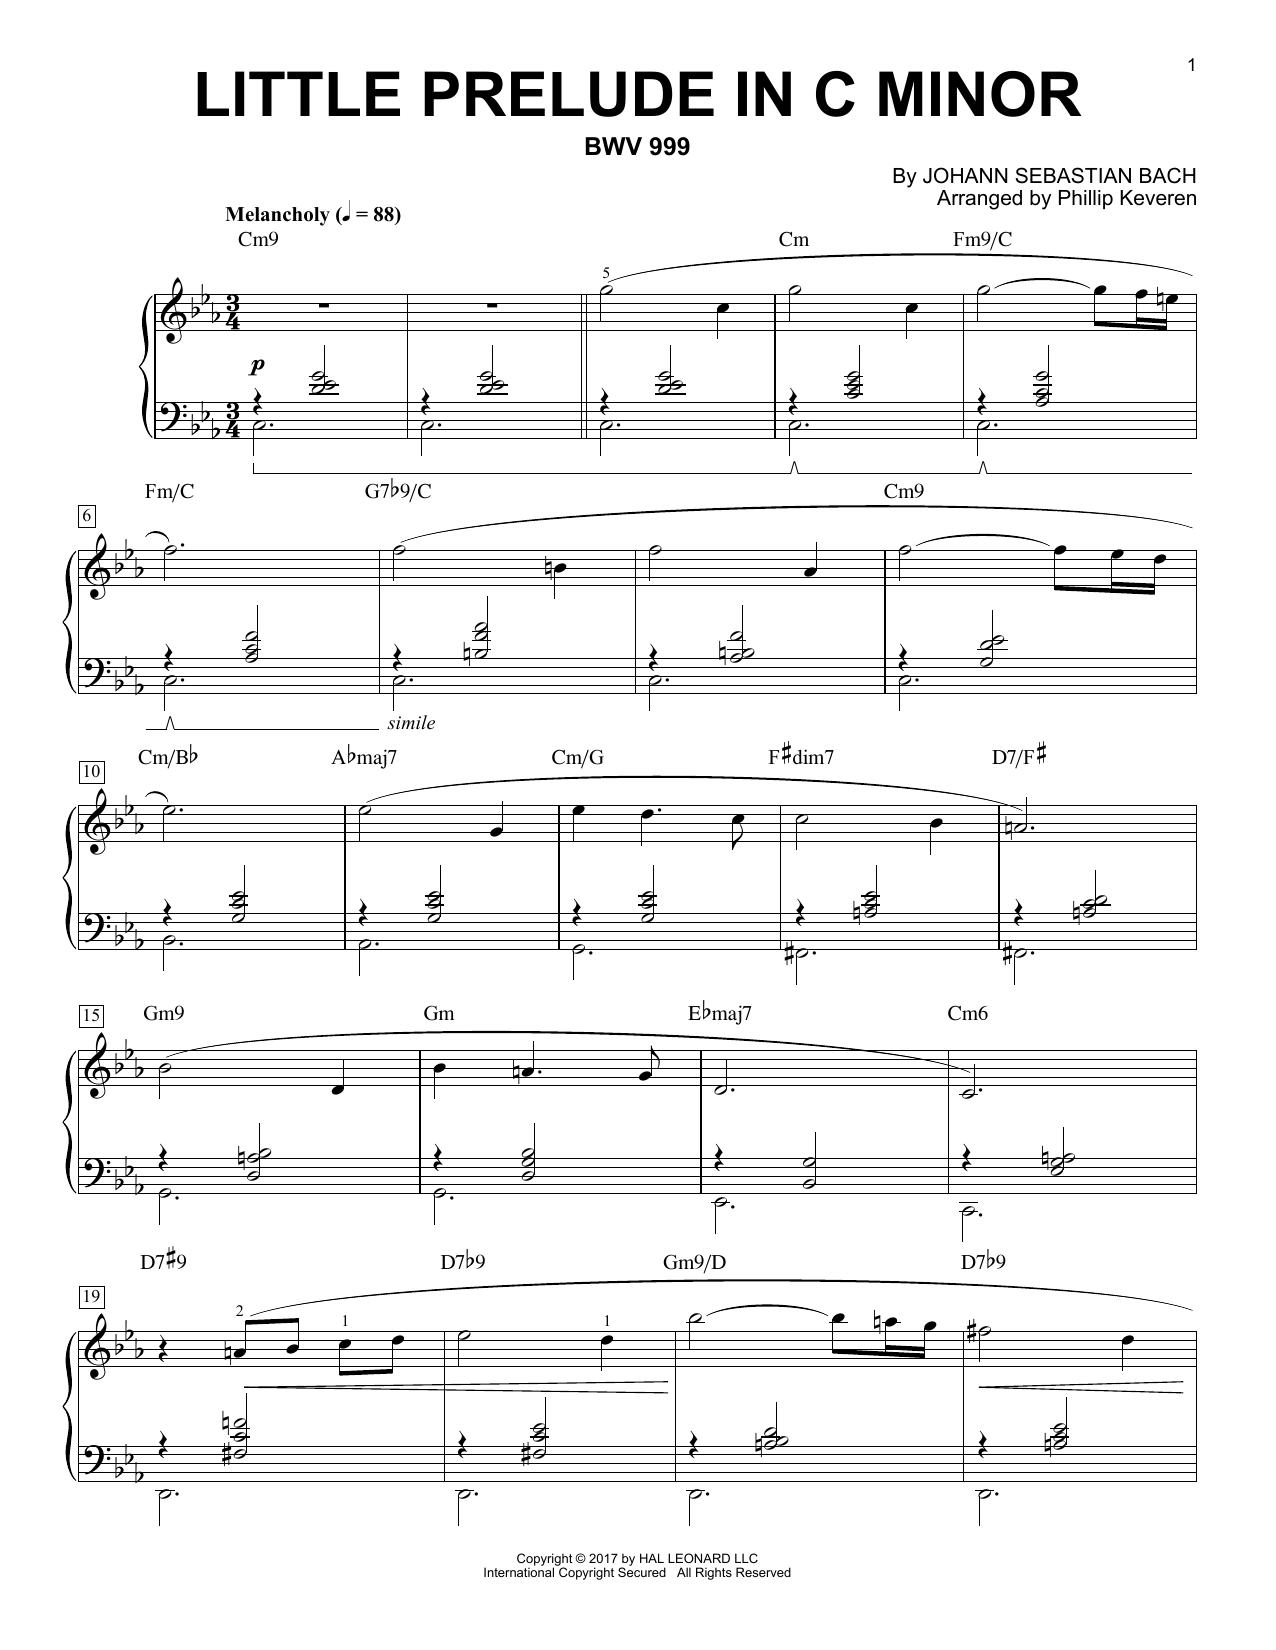 Little Prelude in C Minor, BWV 999